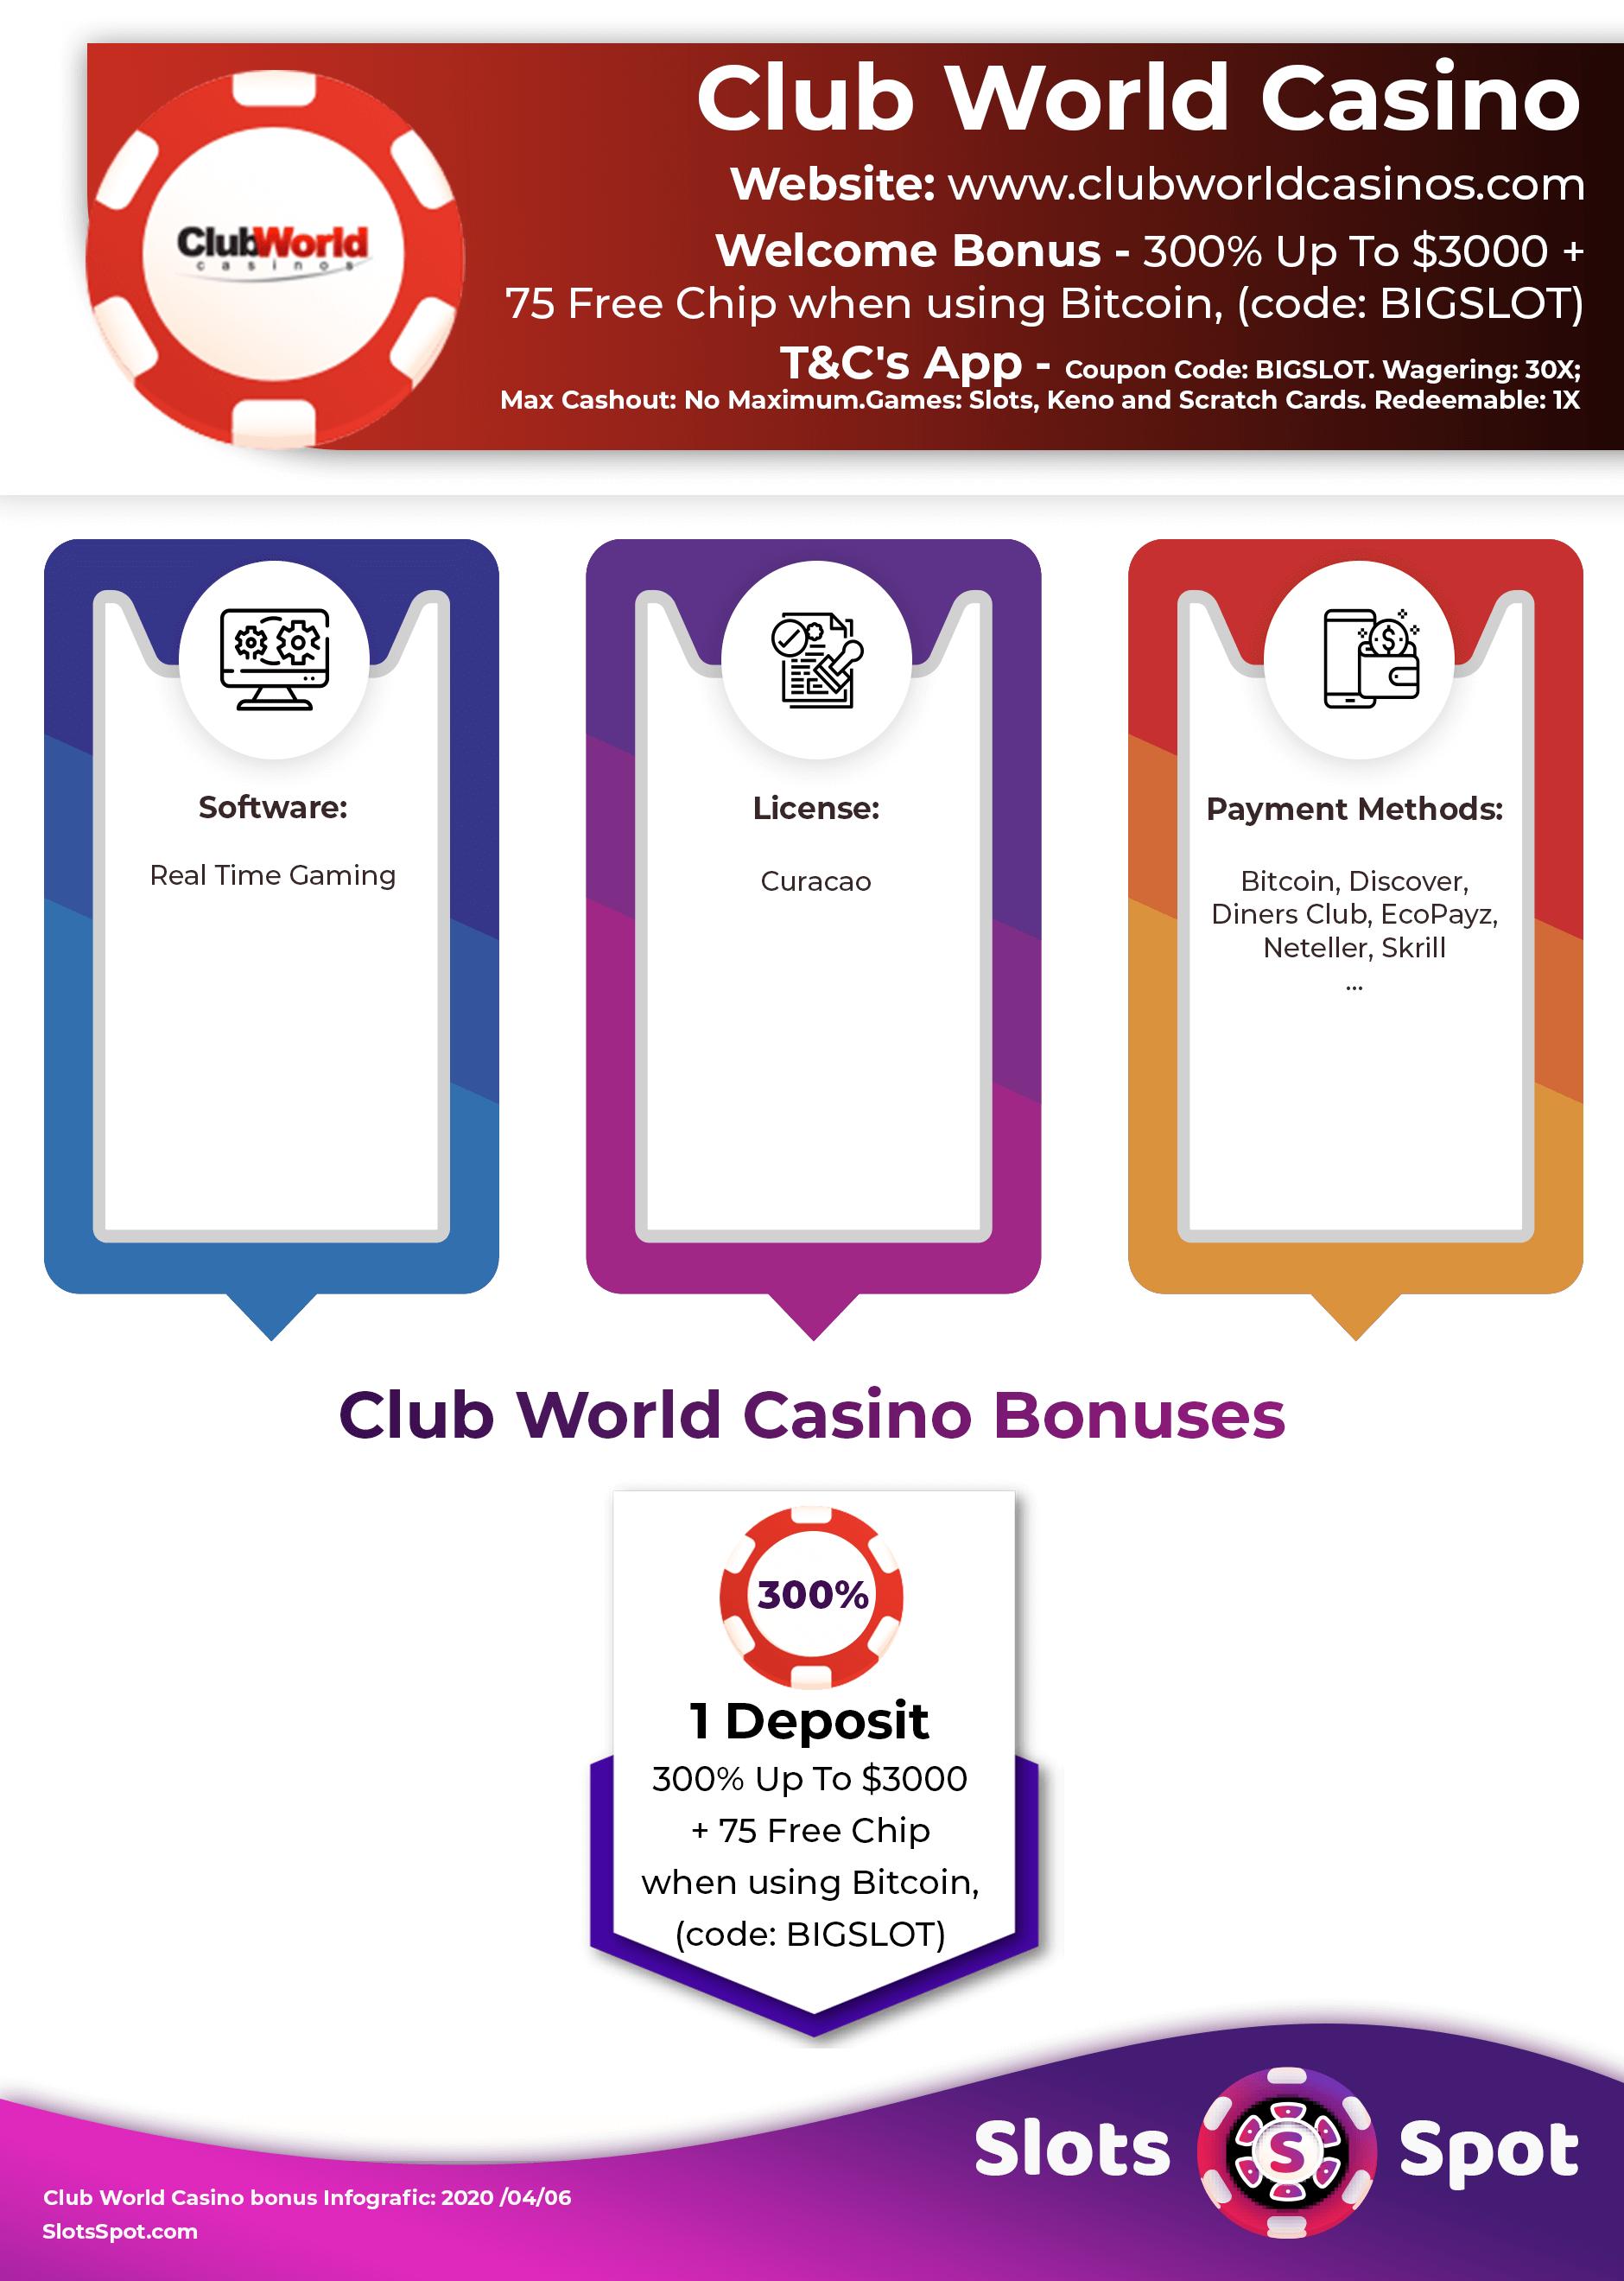 Club World Casino Bonus